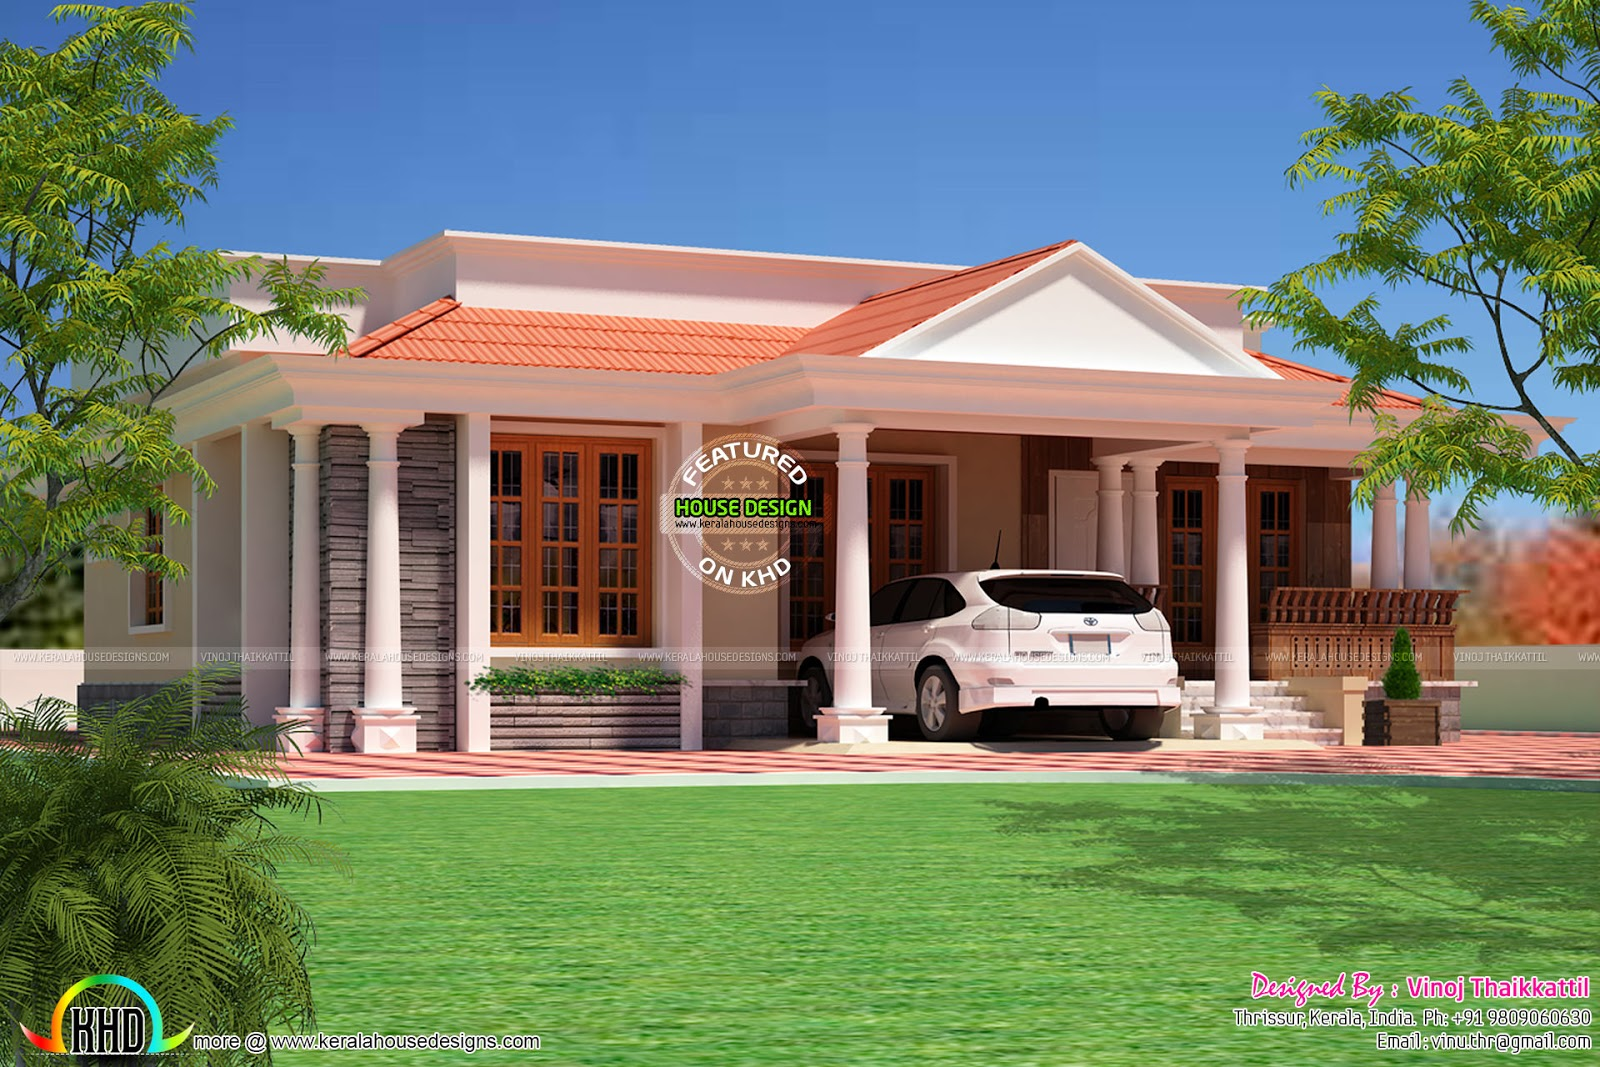 3 bed room home Kerala Traditional Design Kerala home design